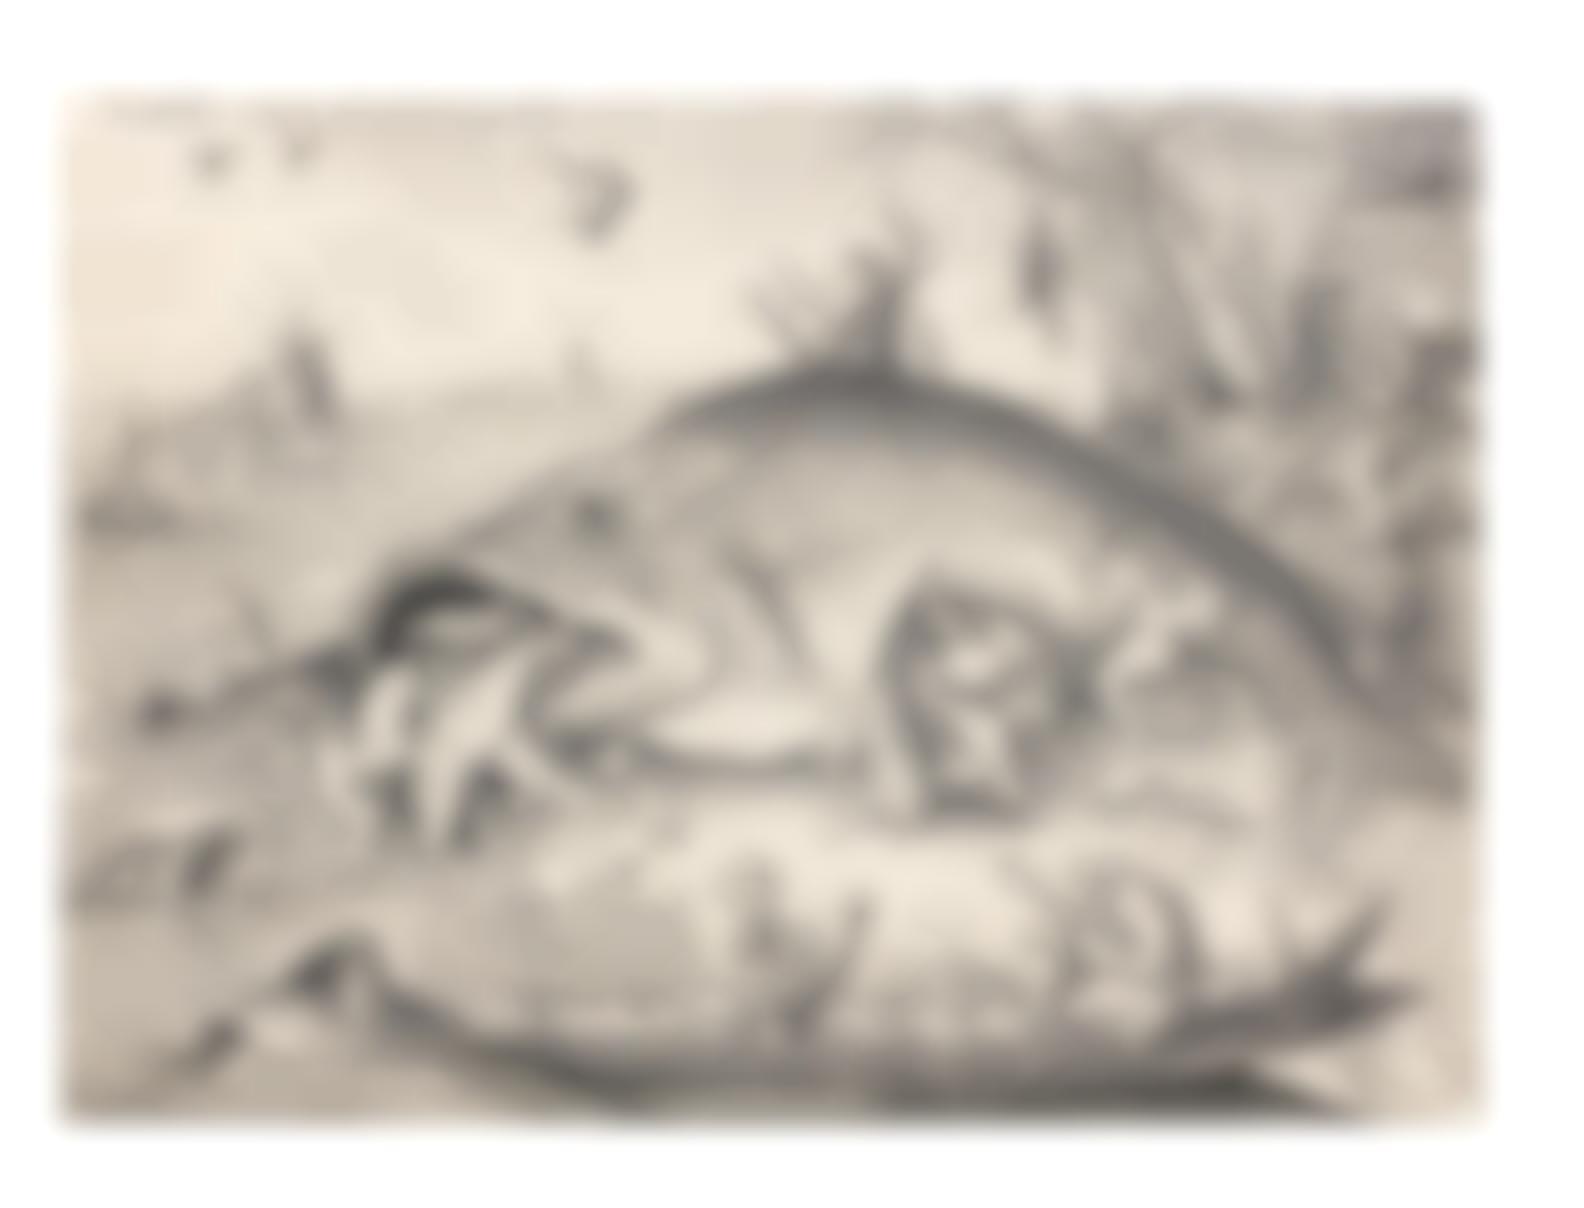 Pieter Bruegel the Elder-After Pieter Bruegel The Elder - The Big Fish Eat The Little Fish (Basteler 140; Lari 134A)-1641